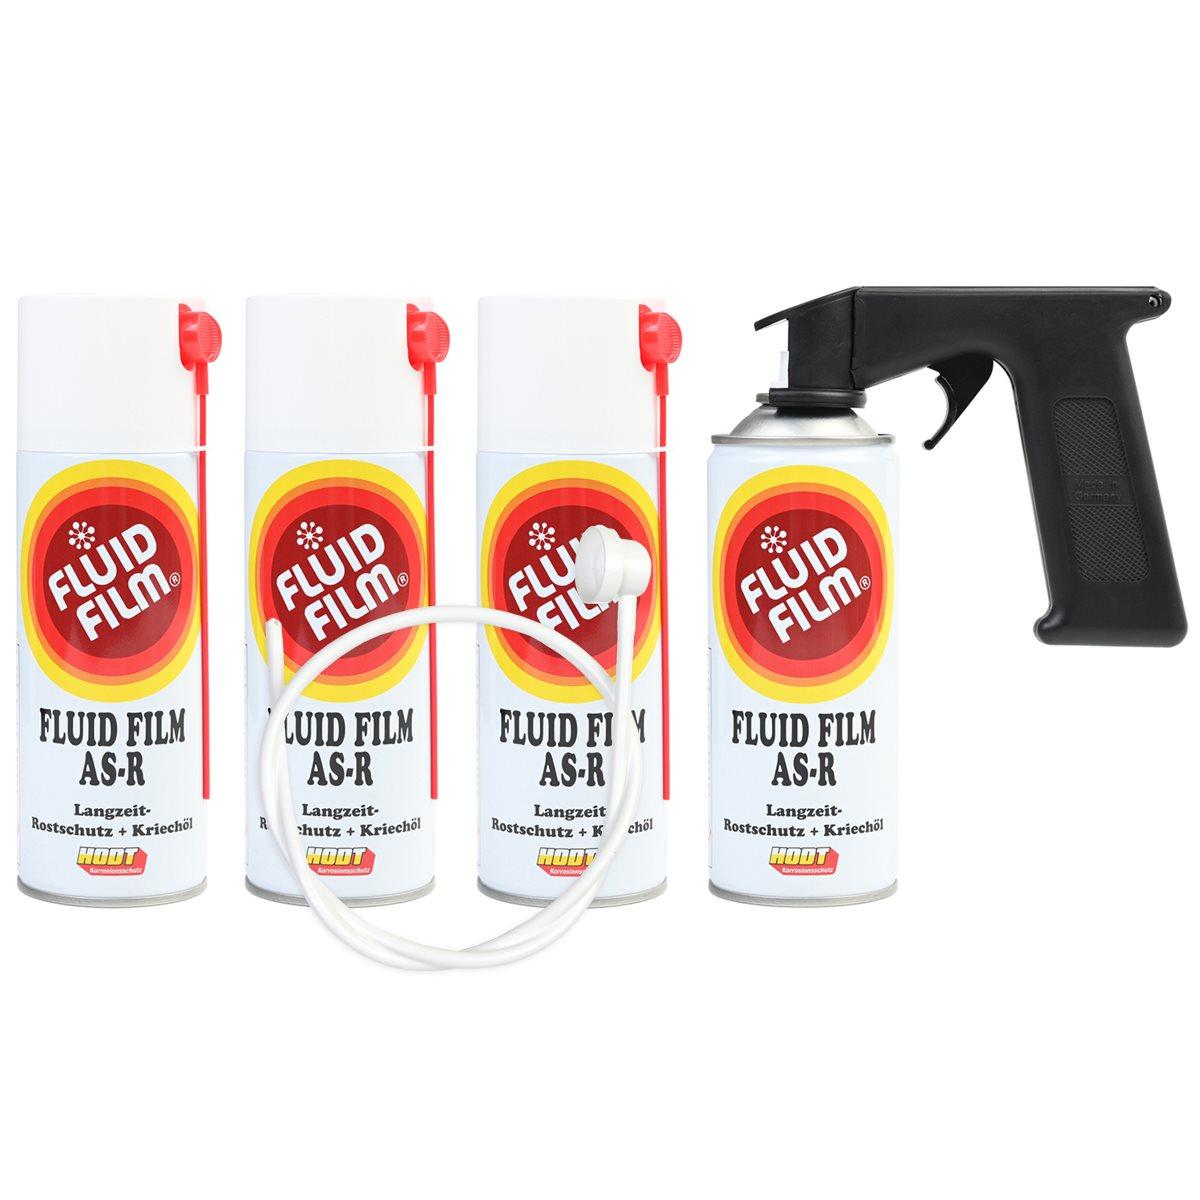 fluid film as r korrosionsschutz kriech l 400 ml 4er set sonde handgriff ebay. Black Bedroom Furniture Sets. Home Design Ideas